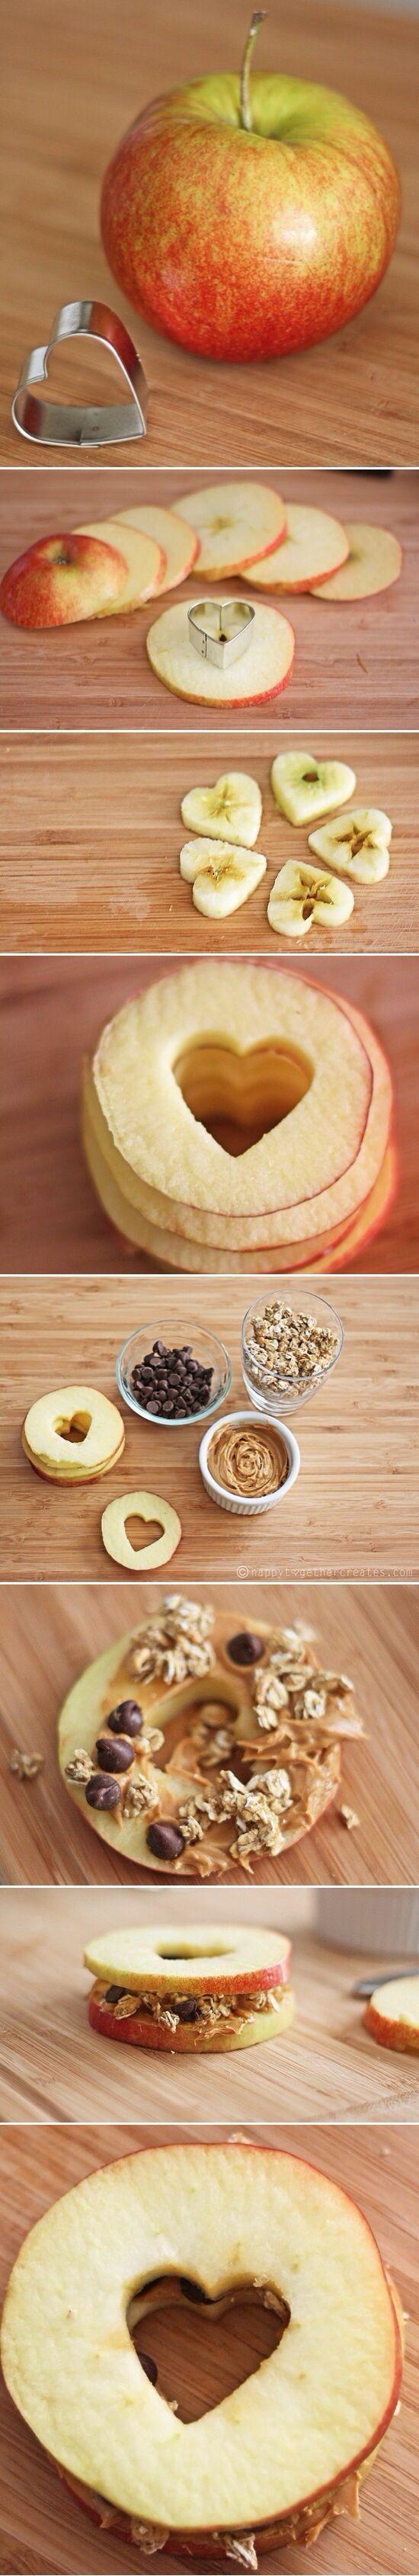 heart apple sandwiches